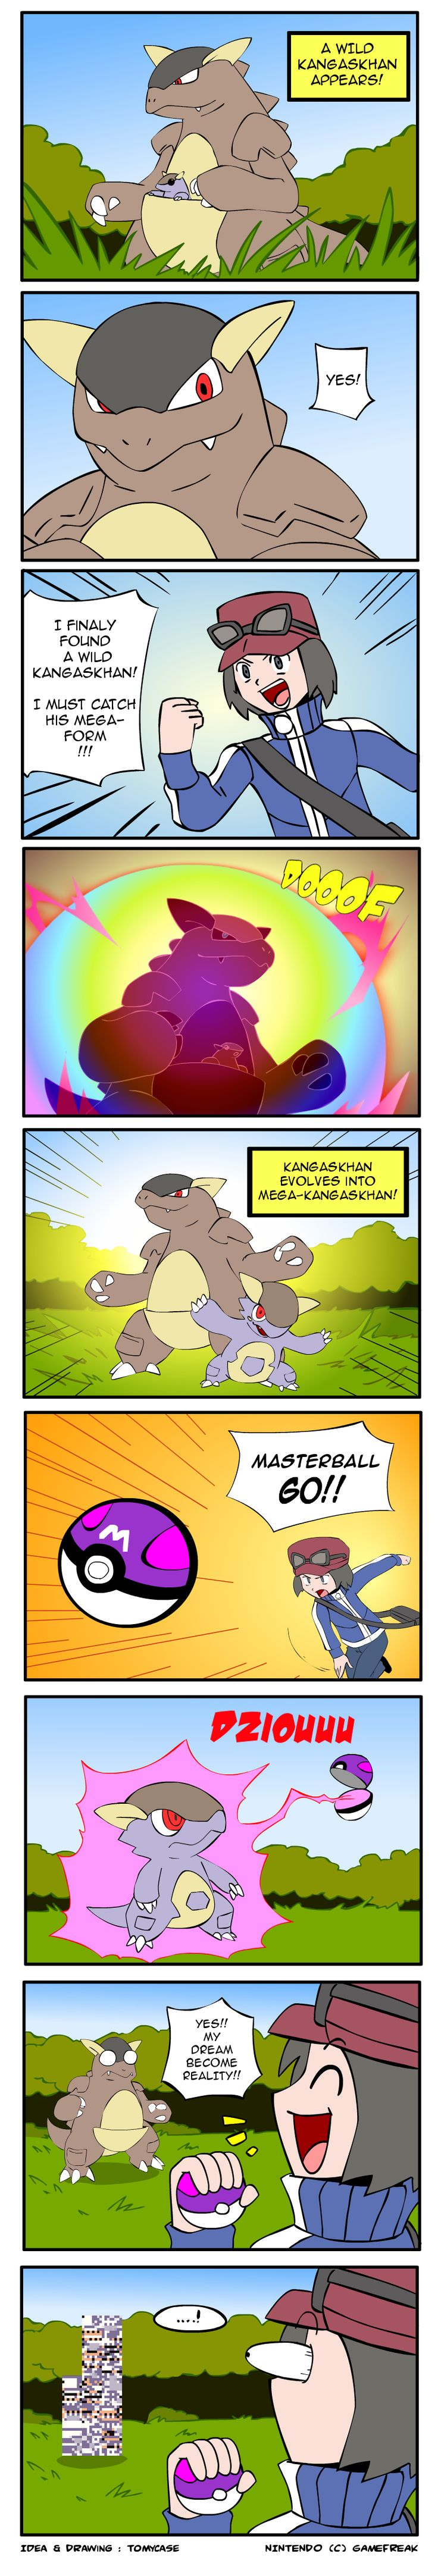 Pokemon X/Y - Mega-Kangaskhan Error